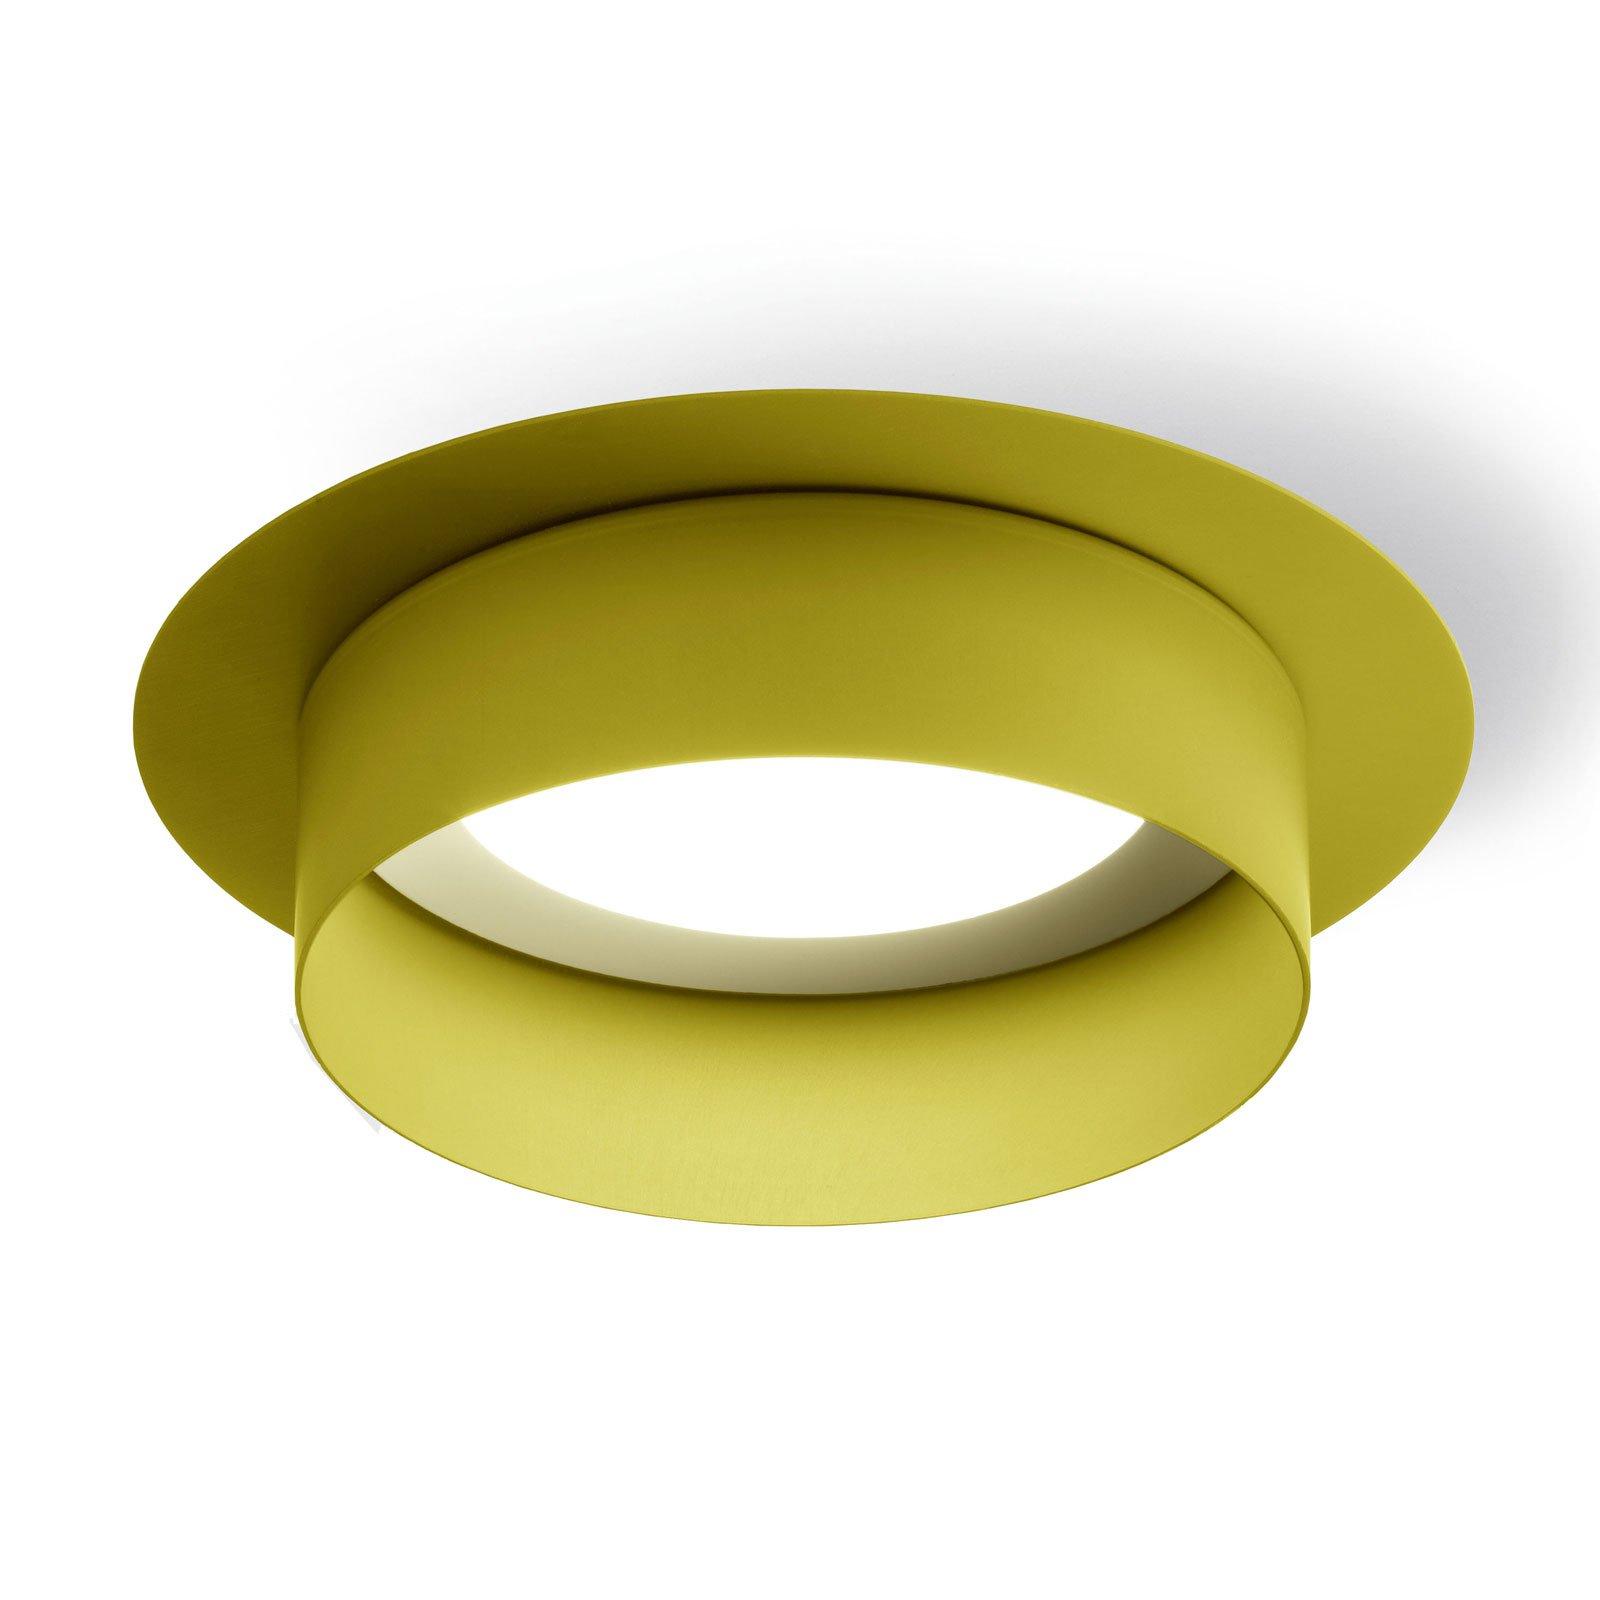 Modo Luce Hammer taklampe dir. Ø 18 cm lysegrønn